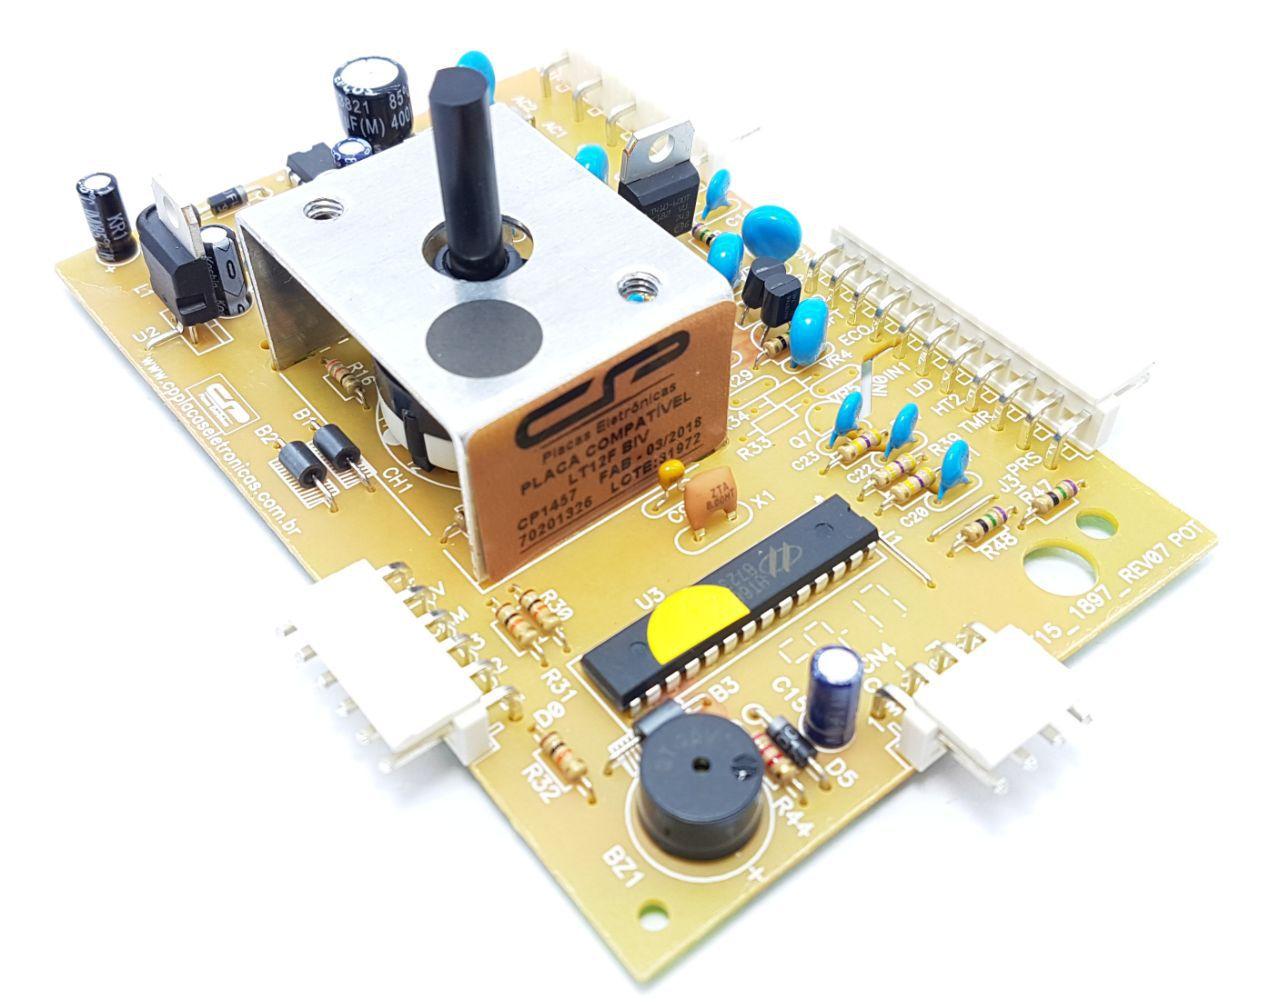 Placa Eletrônica Compatível  Electrolux Lt12f 70201326 Bivolt Cp1457